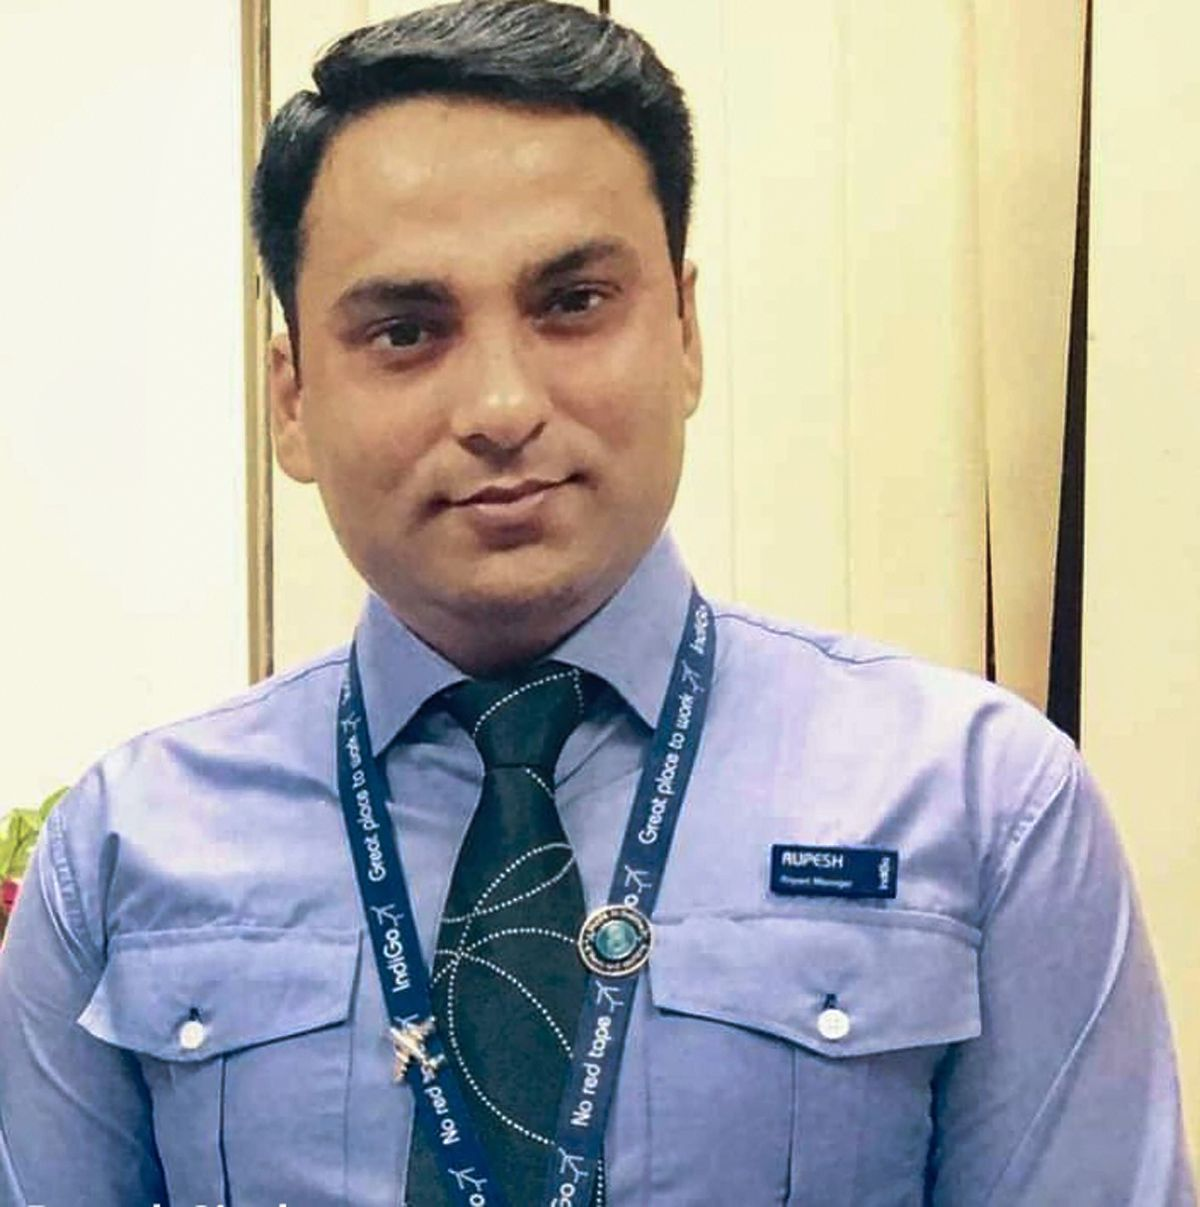 Bihar Indigo manager killed over road rage, say cops